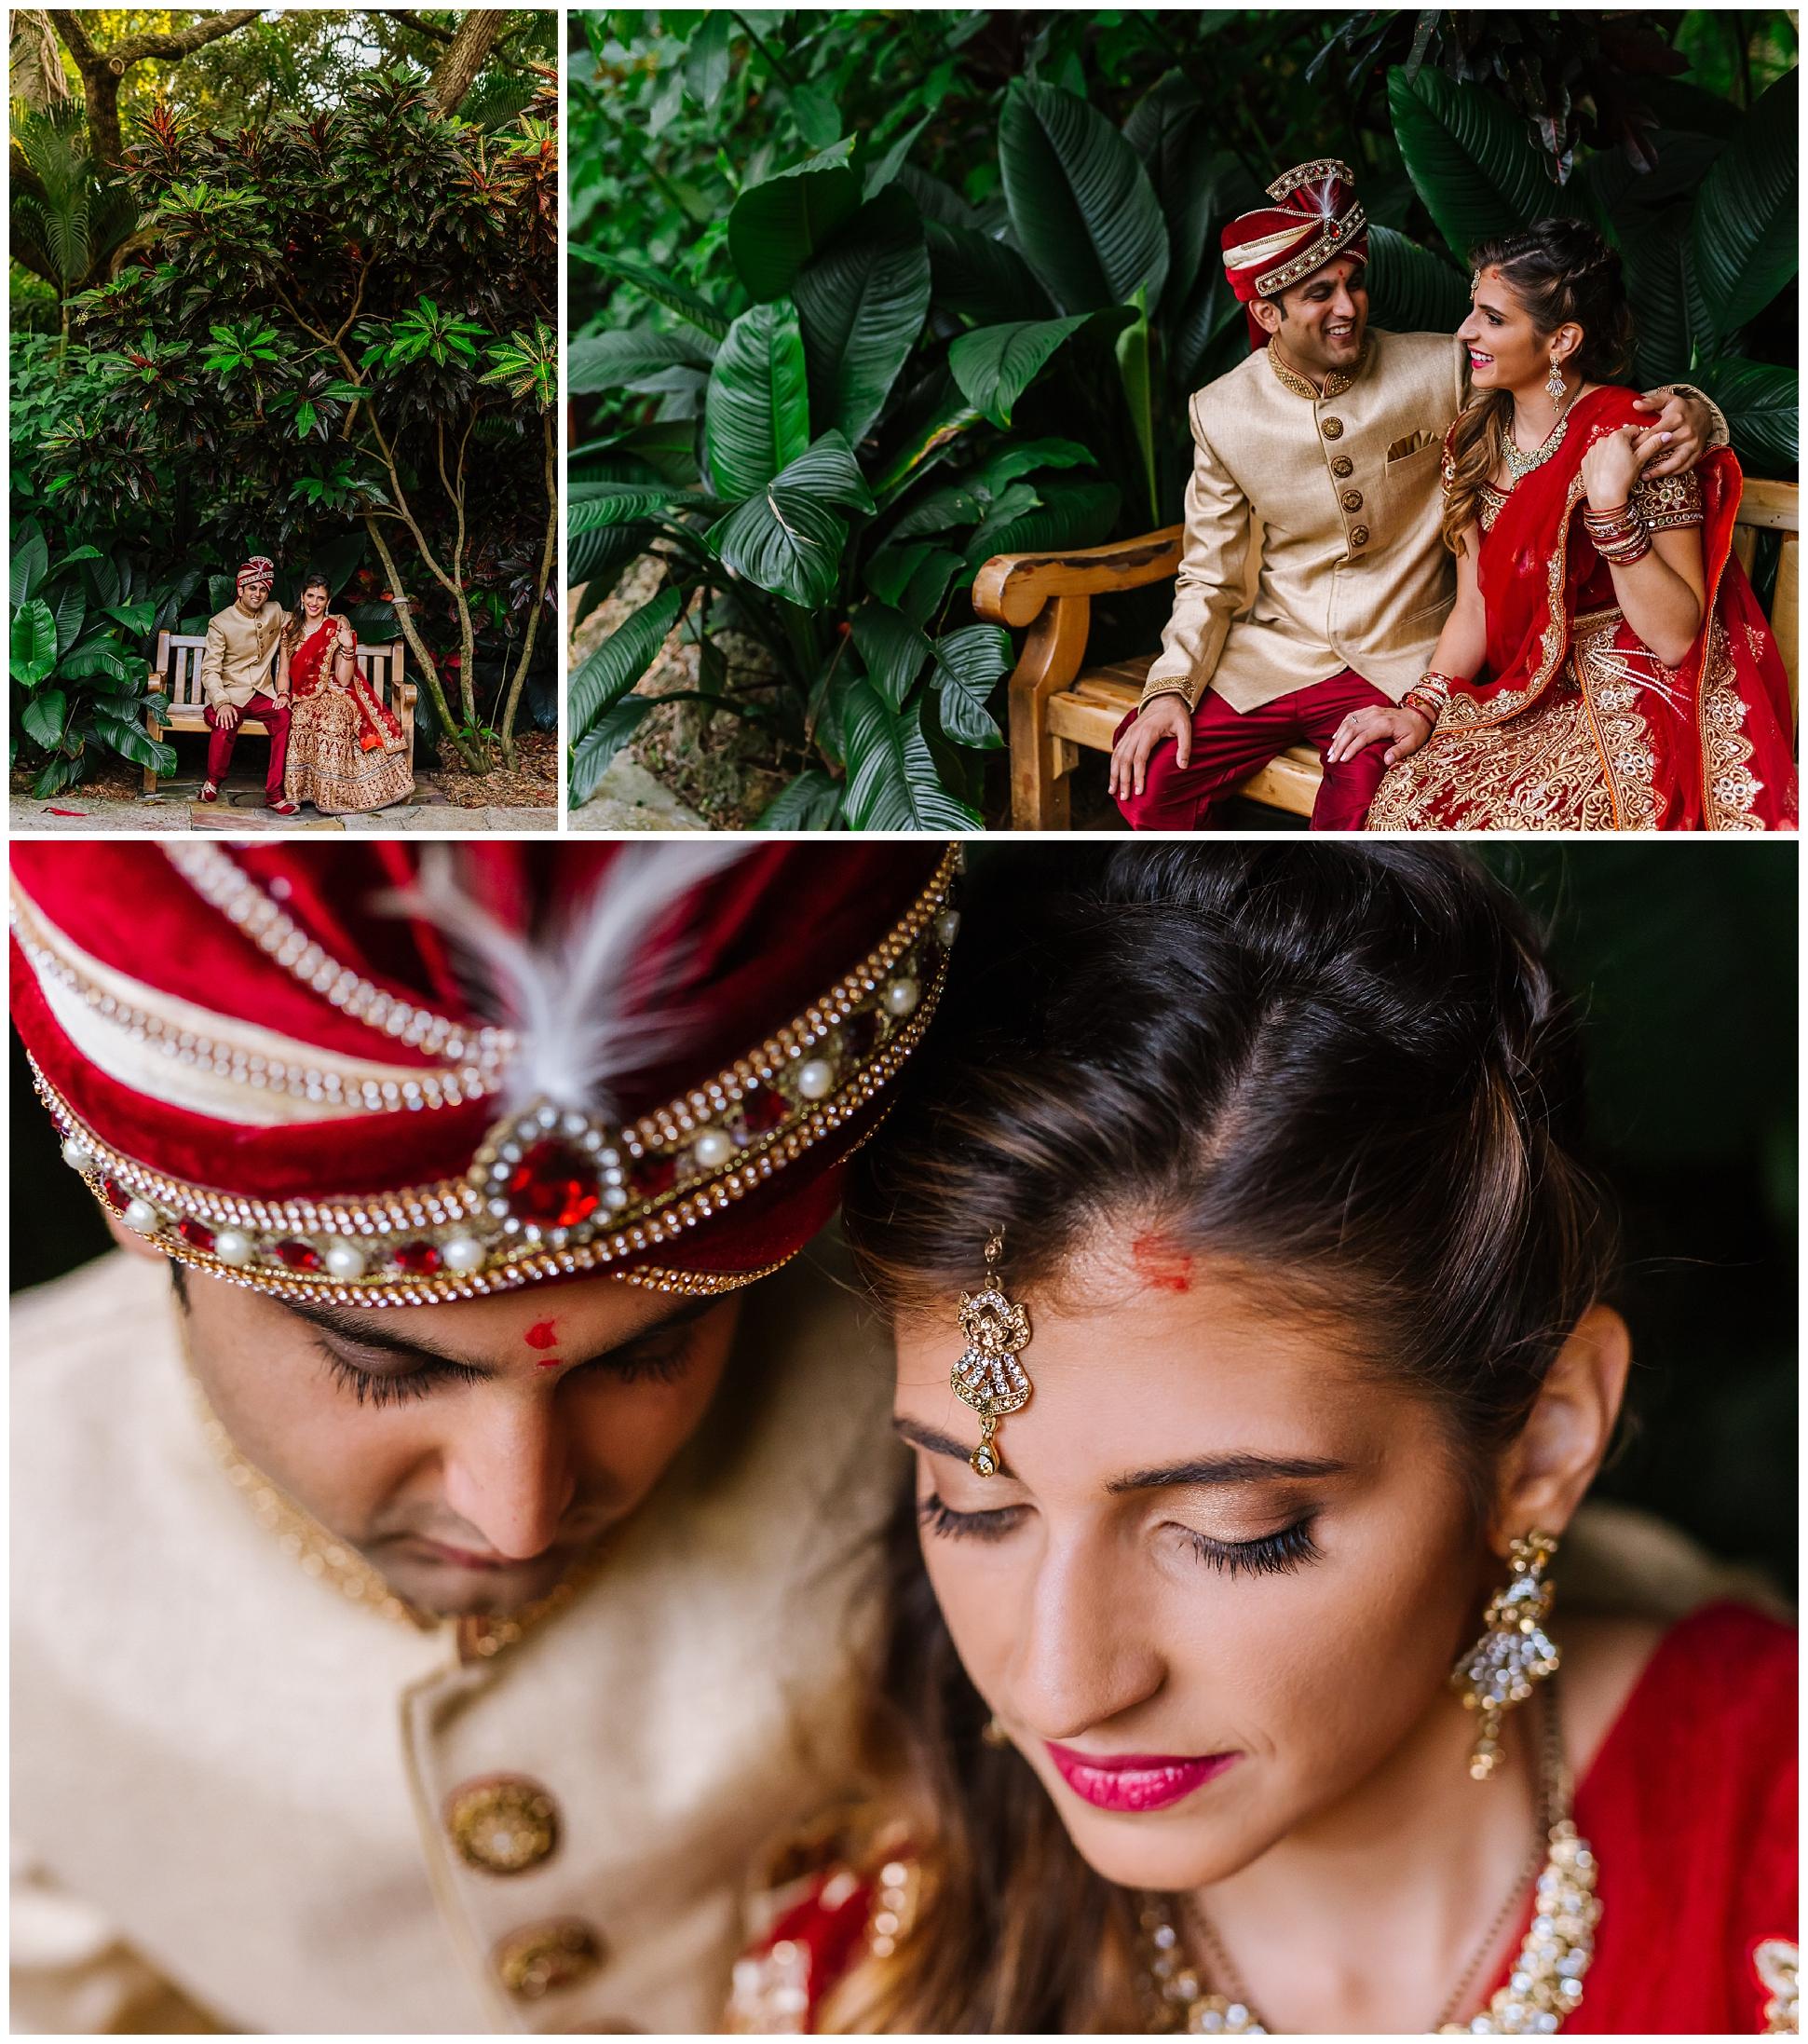 St-pete-indian-wedding-photographer-barat-sunken-gardens_0136.jpg